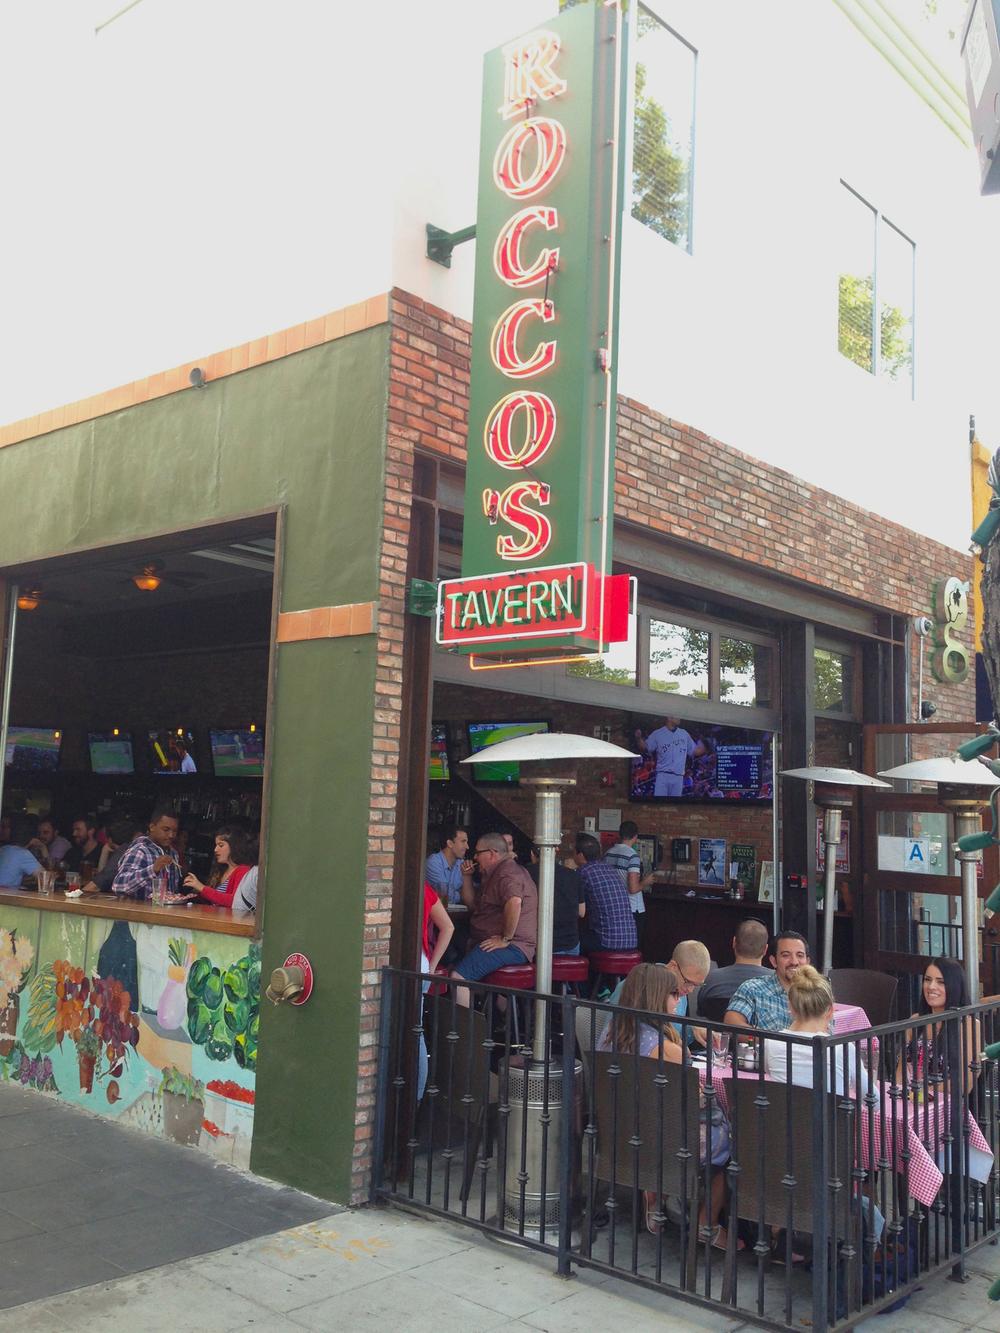 ccw - bar - exterior roccos tavern.jpg